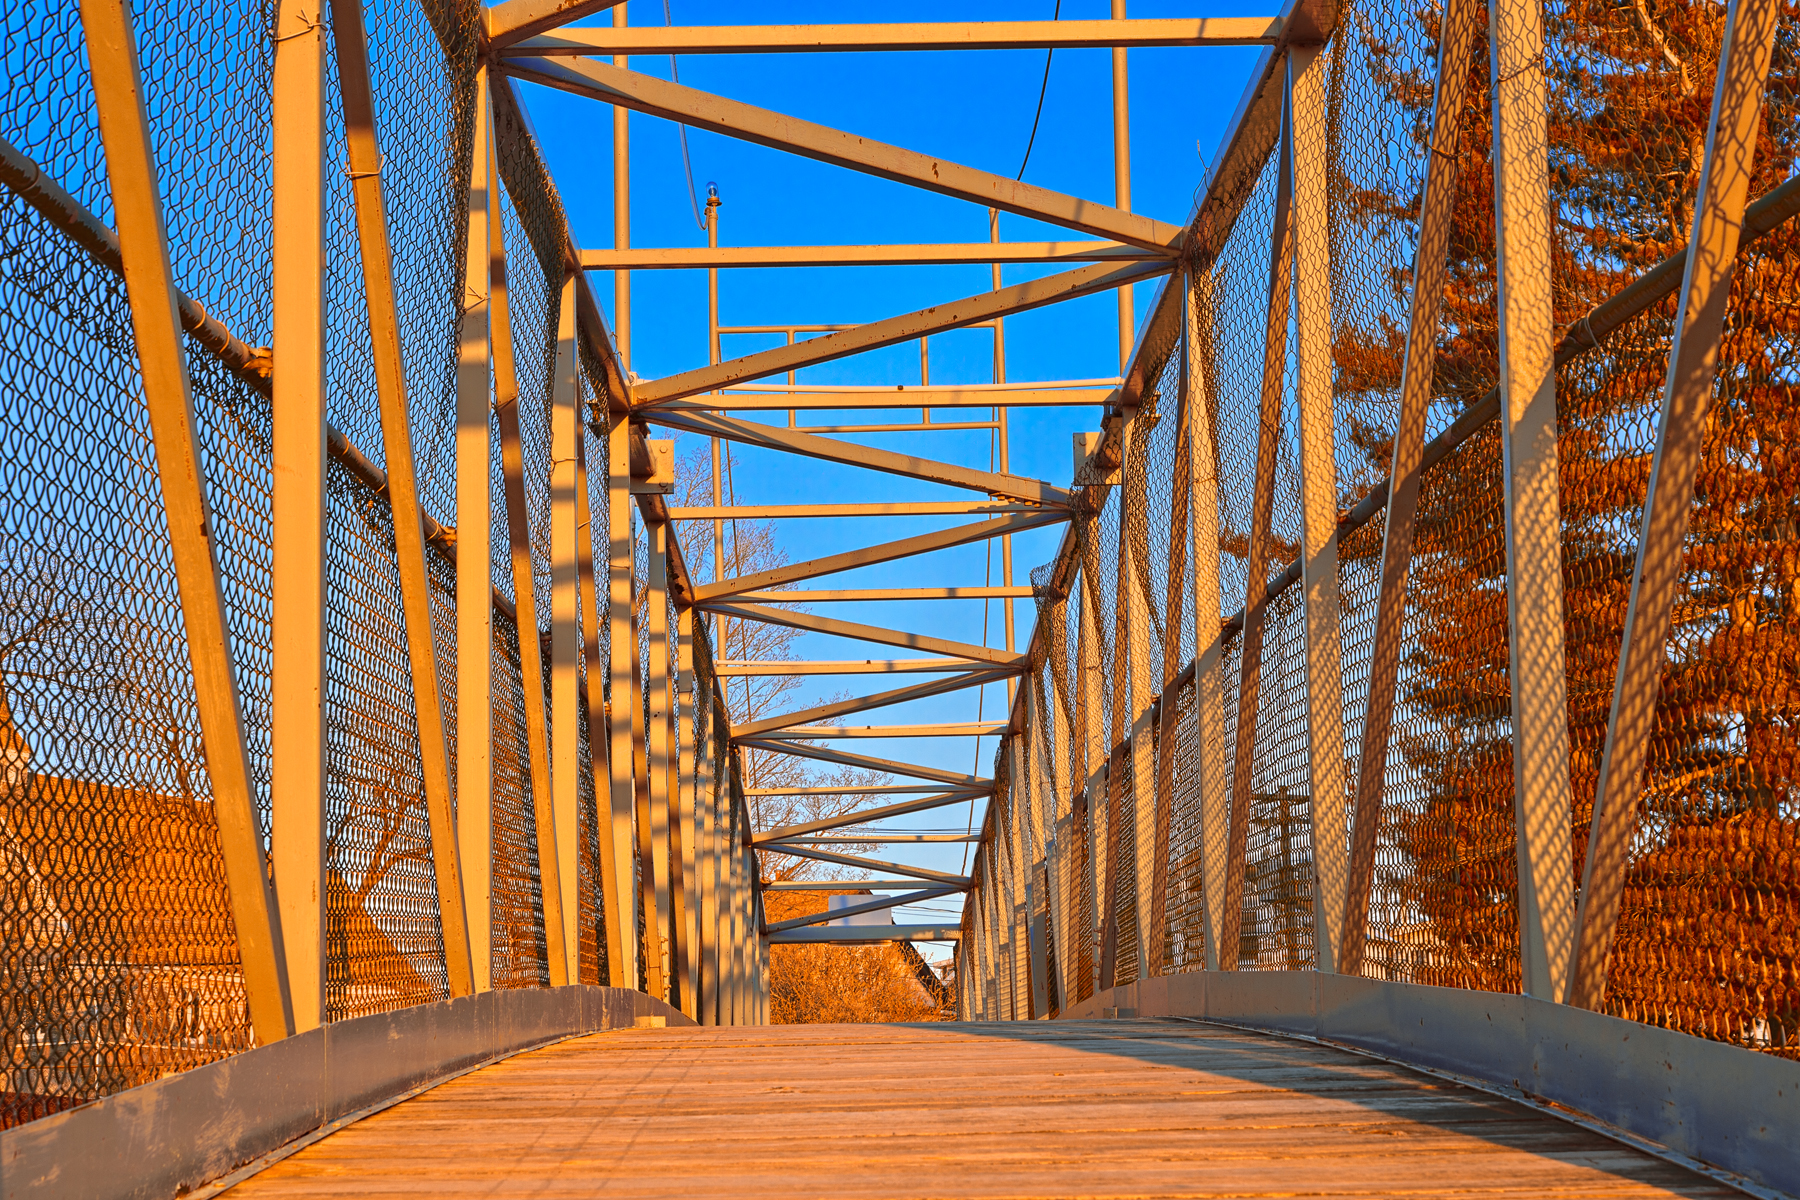 Golden Sunset Bridge - HDR, 1000, Rail, Shades, Shade, HQ Photo